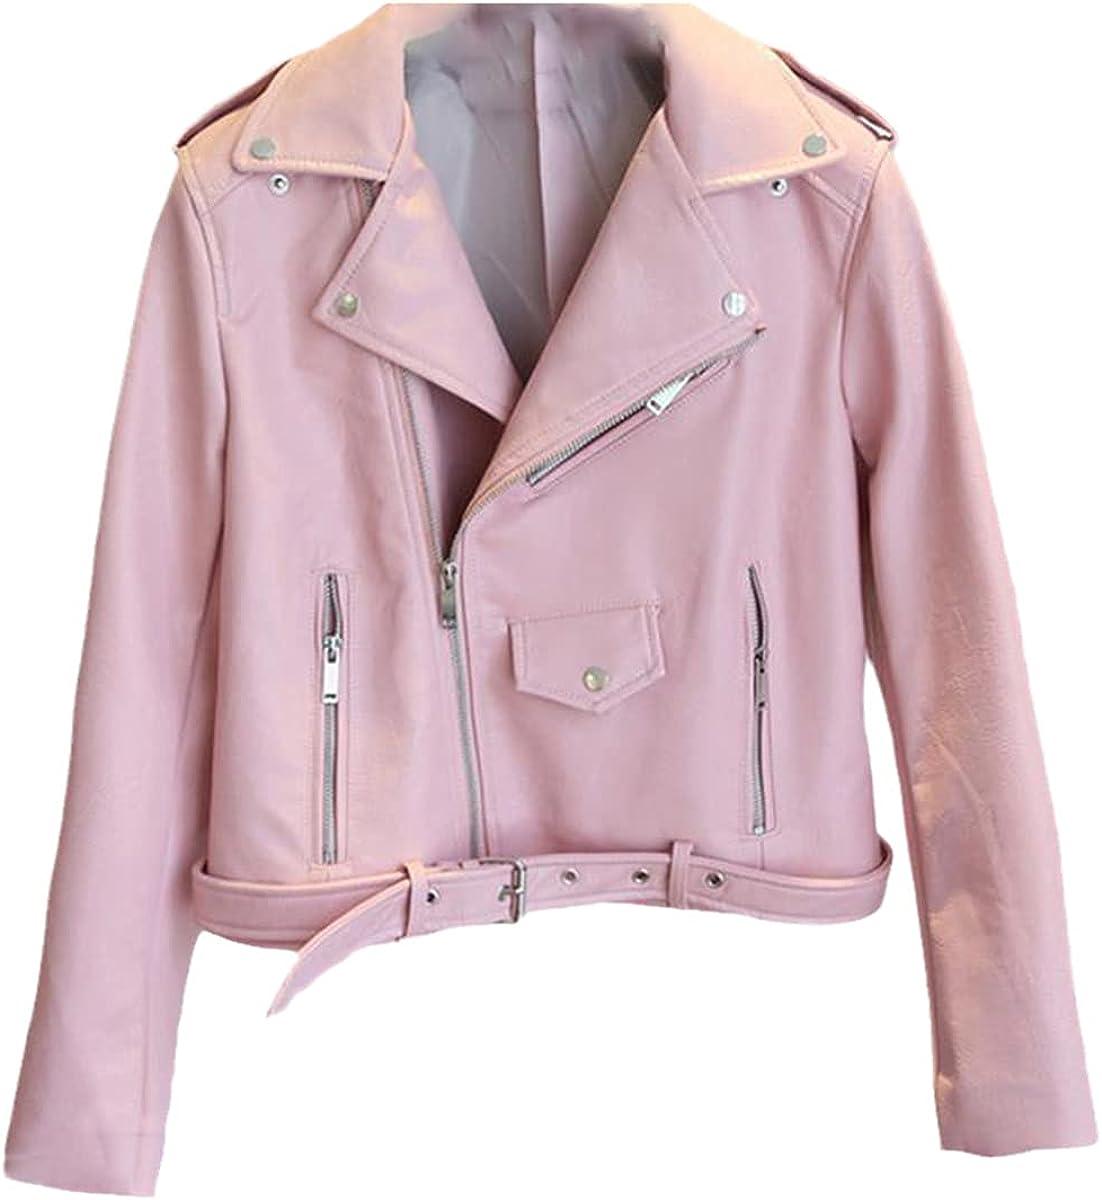 Fashion PU Leather Jacket Women Bright Color Motorcycle Jacket Short Faux Leather Motorcycle Jacket